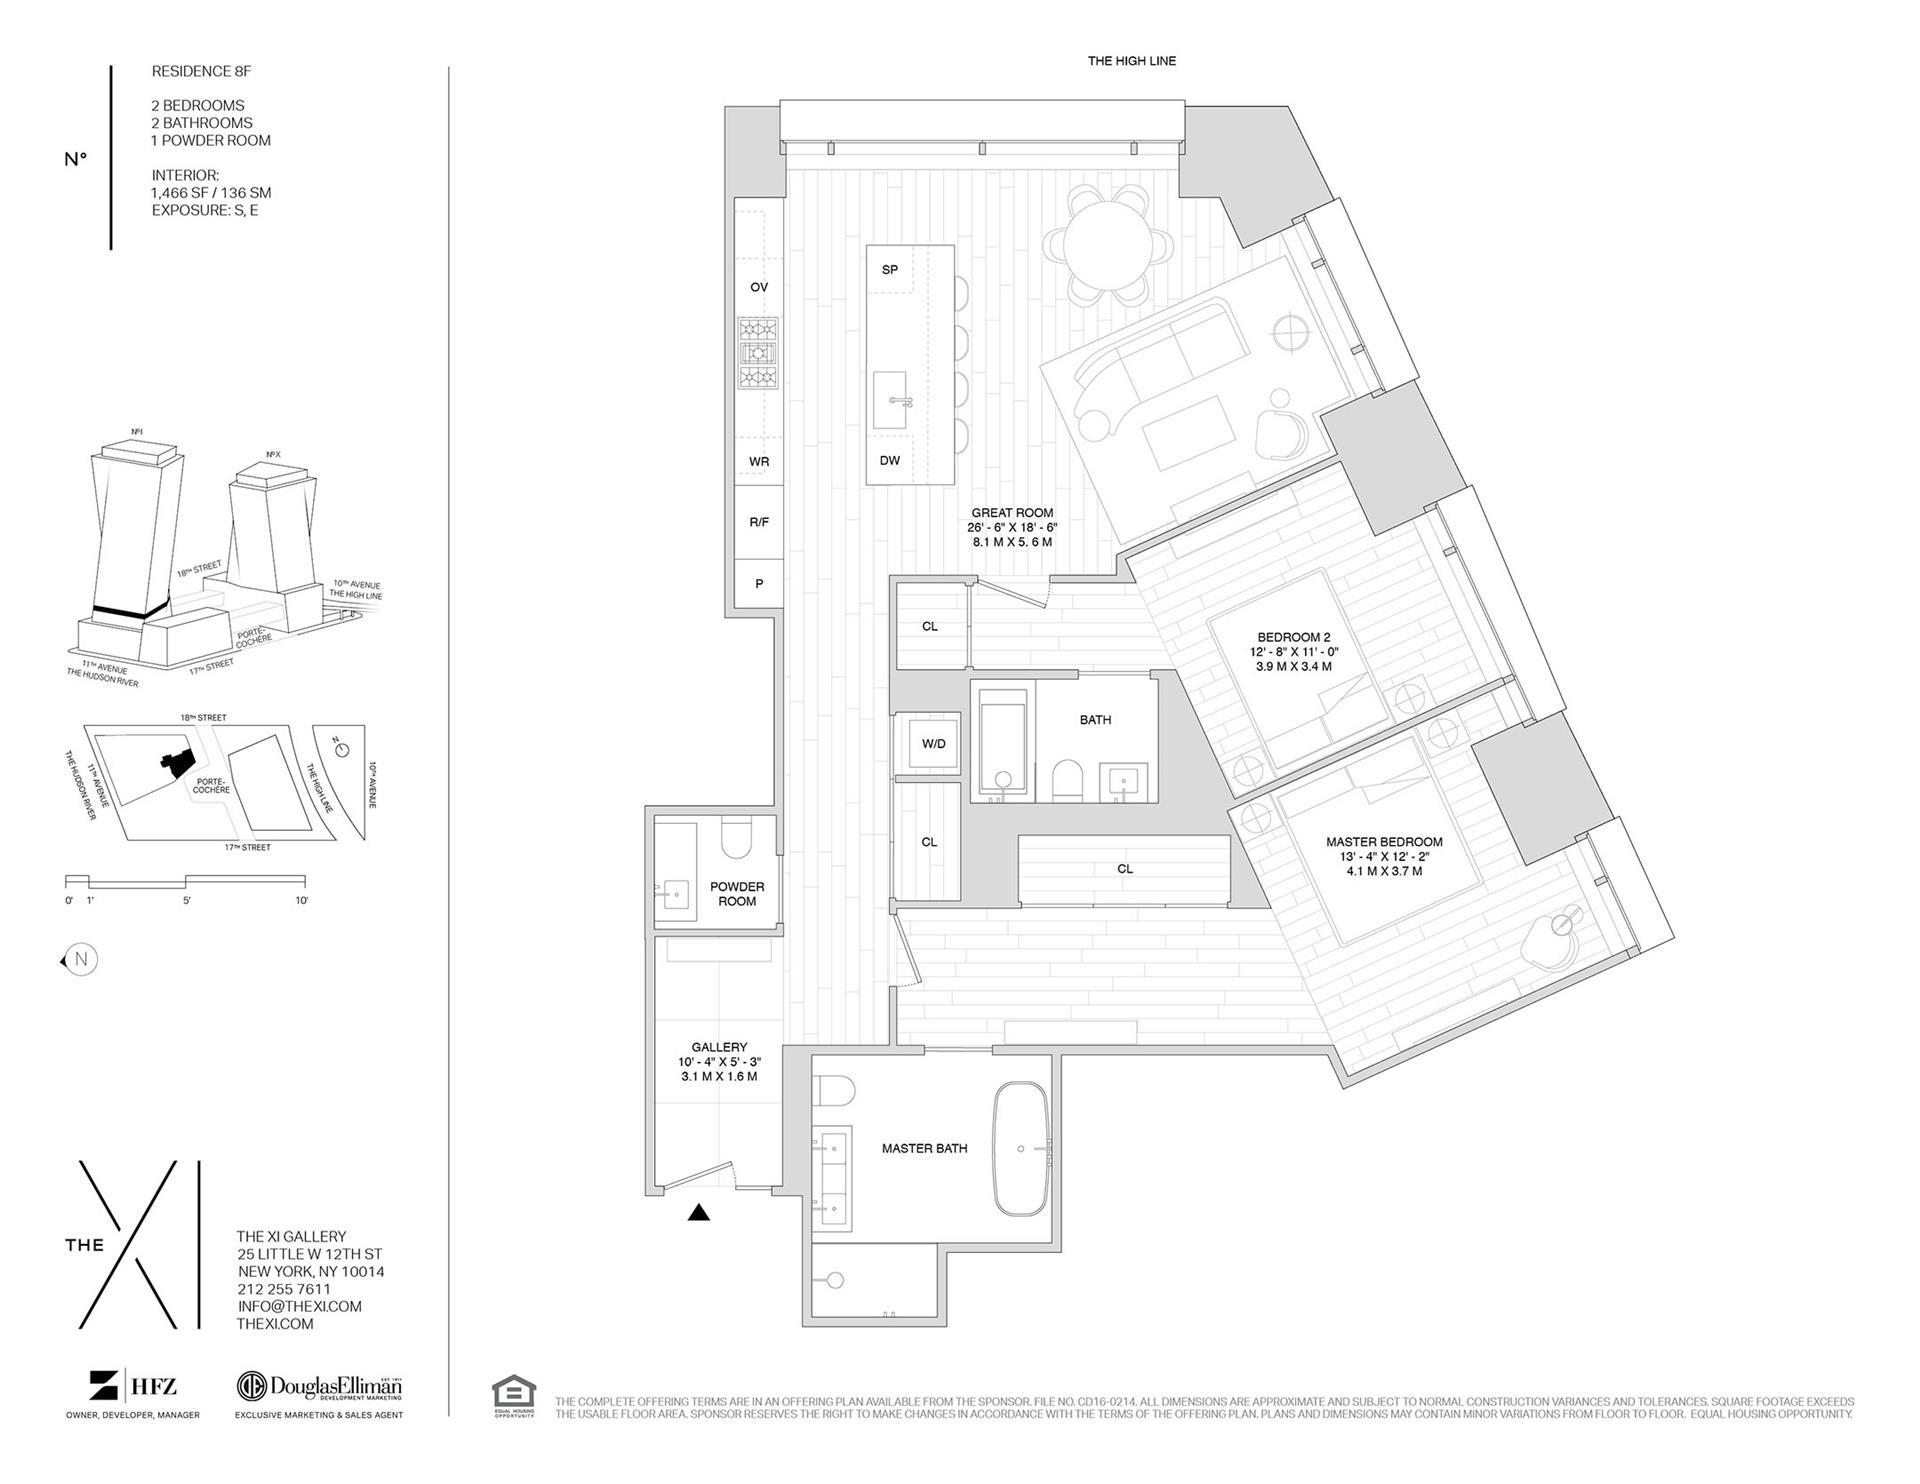 Floor plan of The XI, 76 Eleventh Avenue, 8F - Chelsea, New York